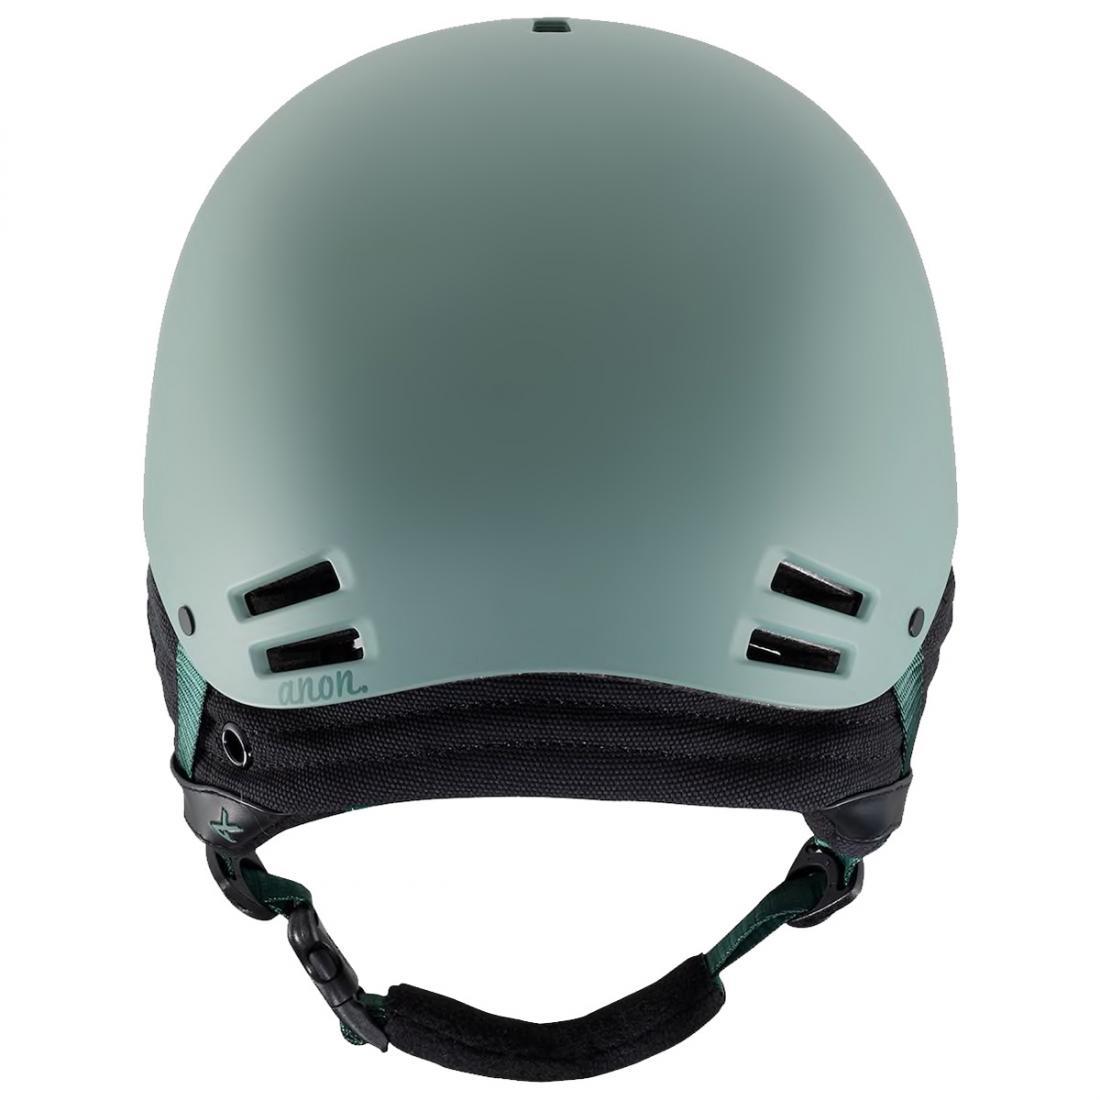 Шлем для сноуборда Anon Greta купить в Boardshop №1